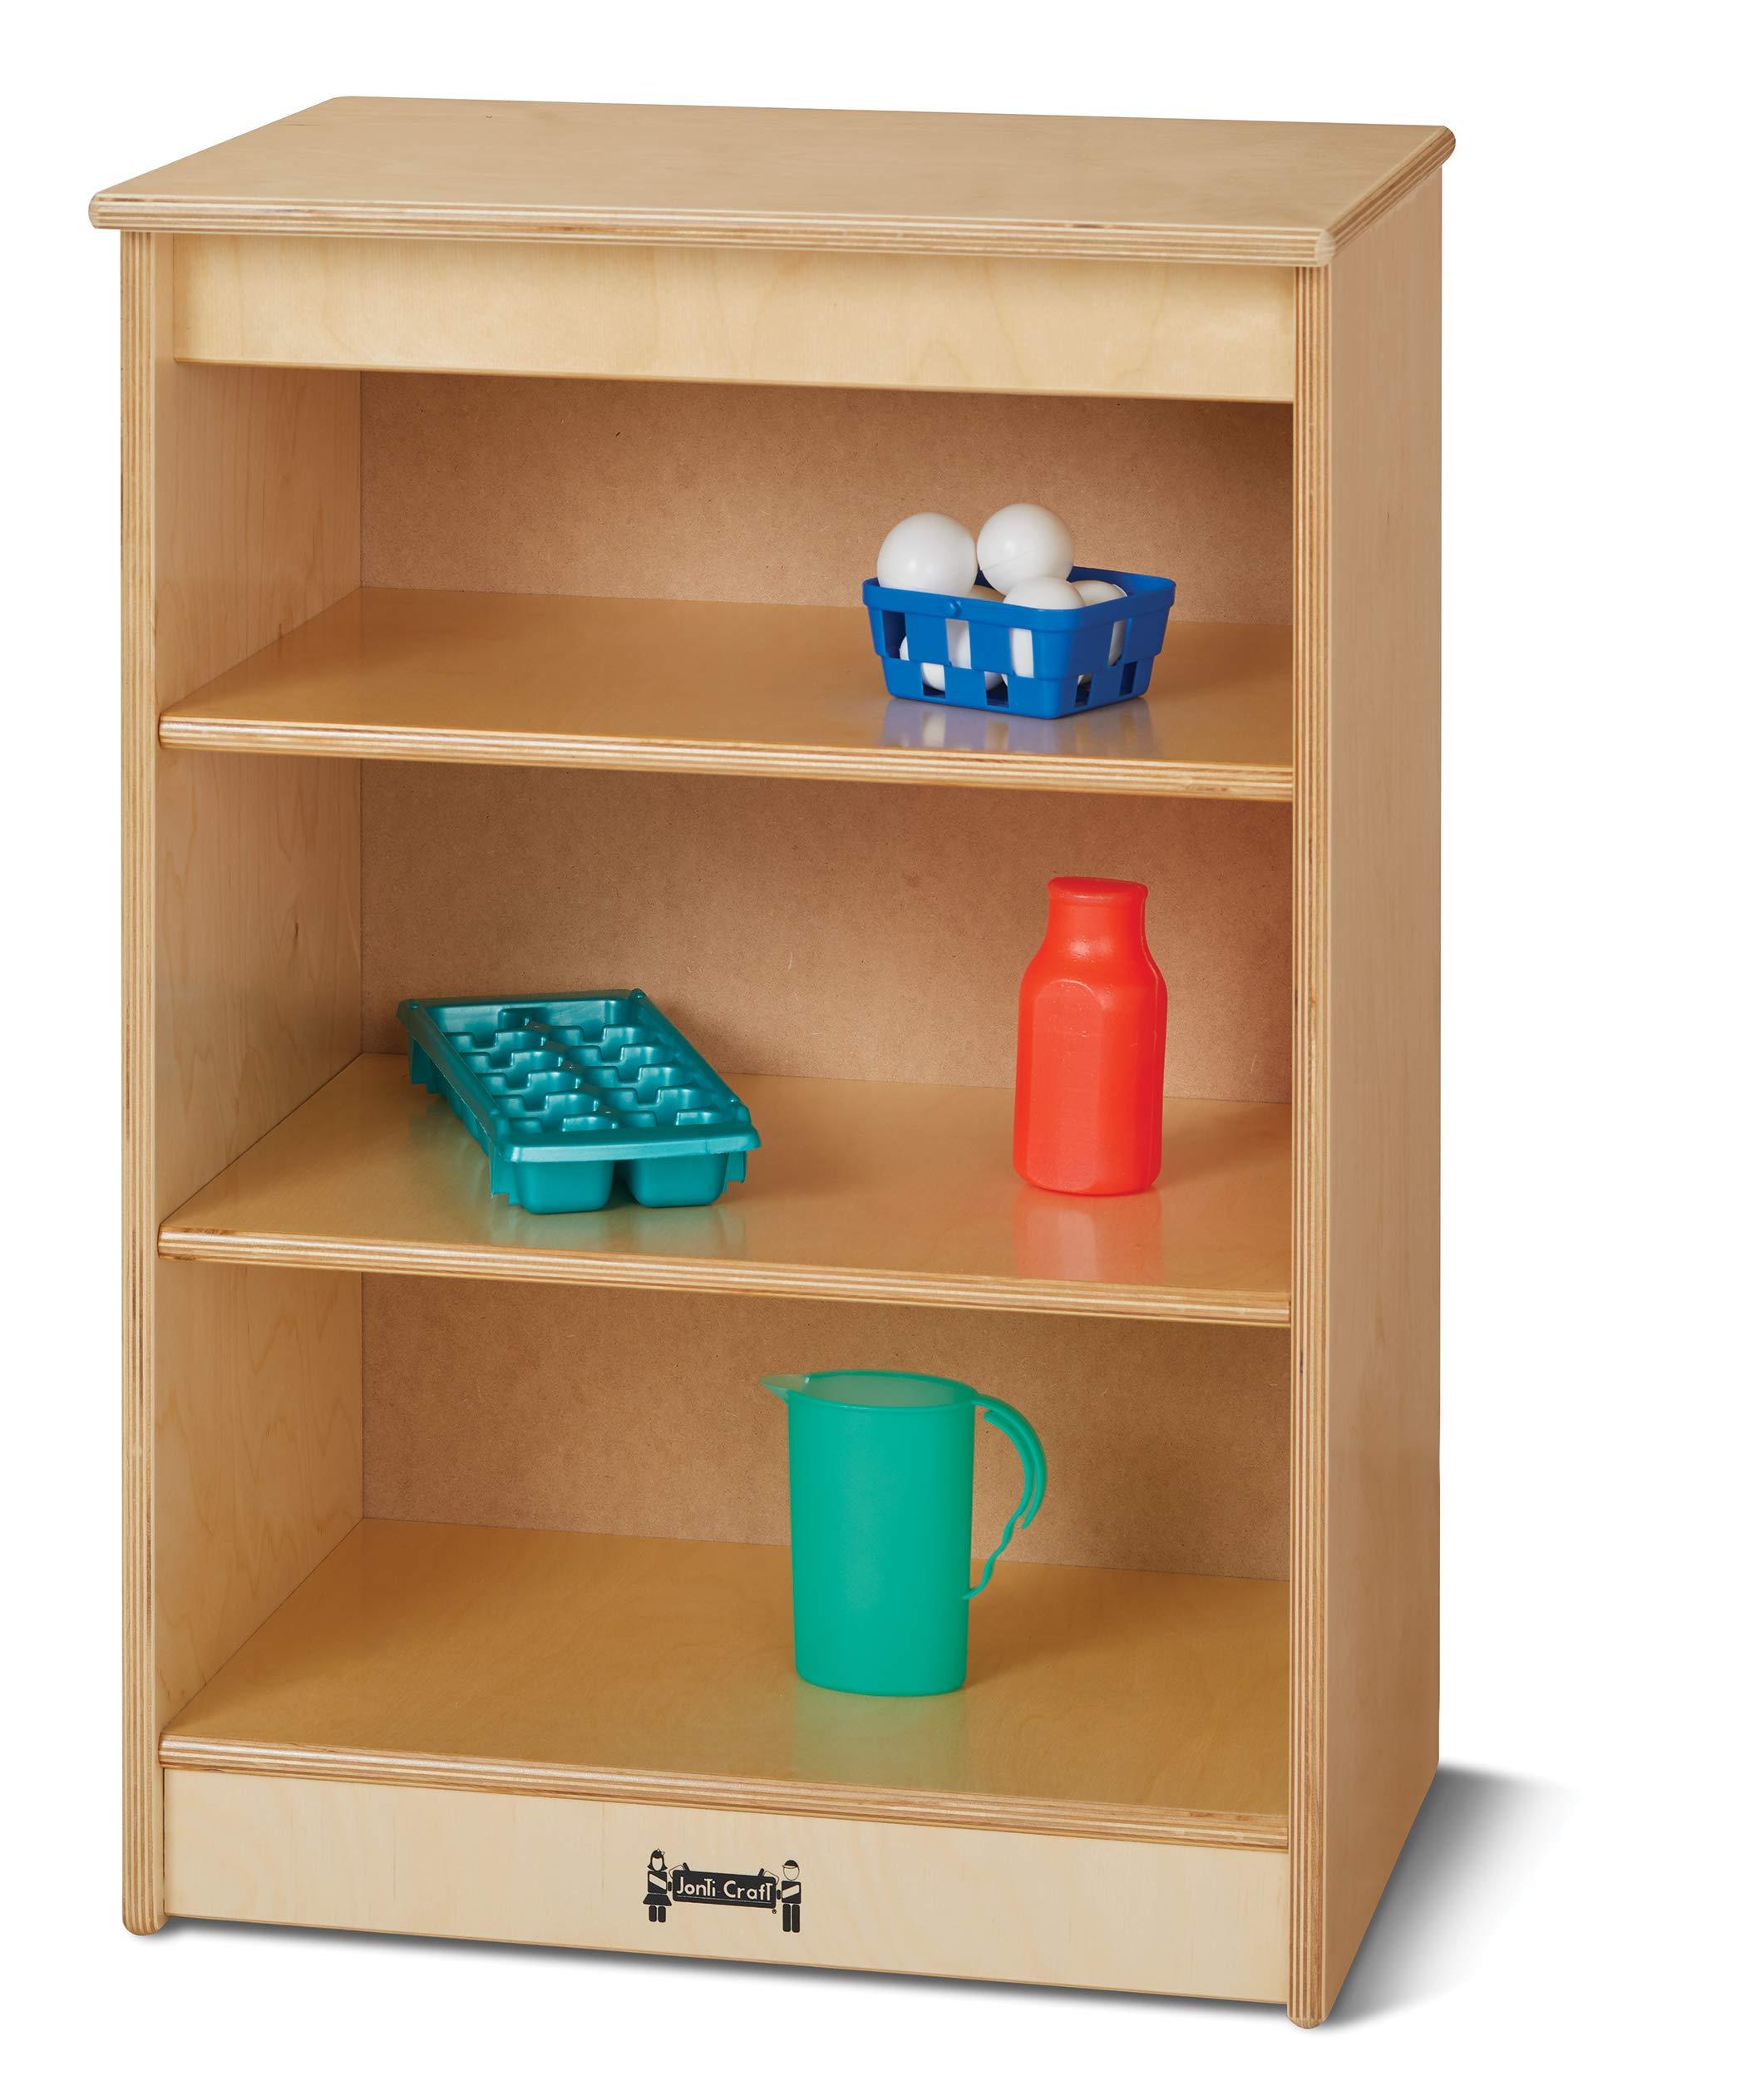 Jonti-Craft 2430JC Toddler Kitchen Refrigerator